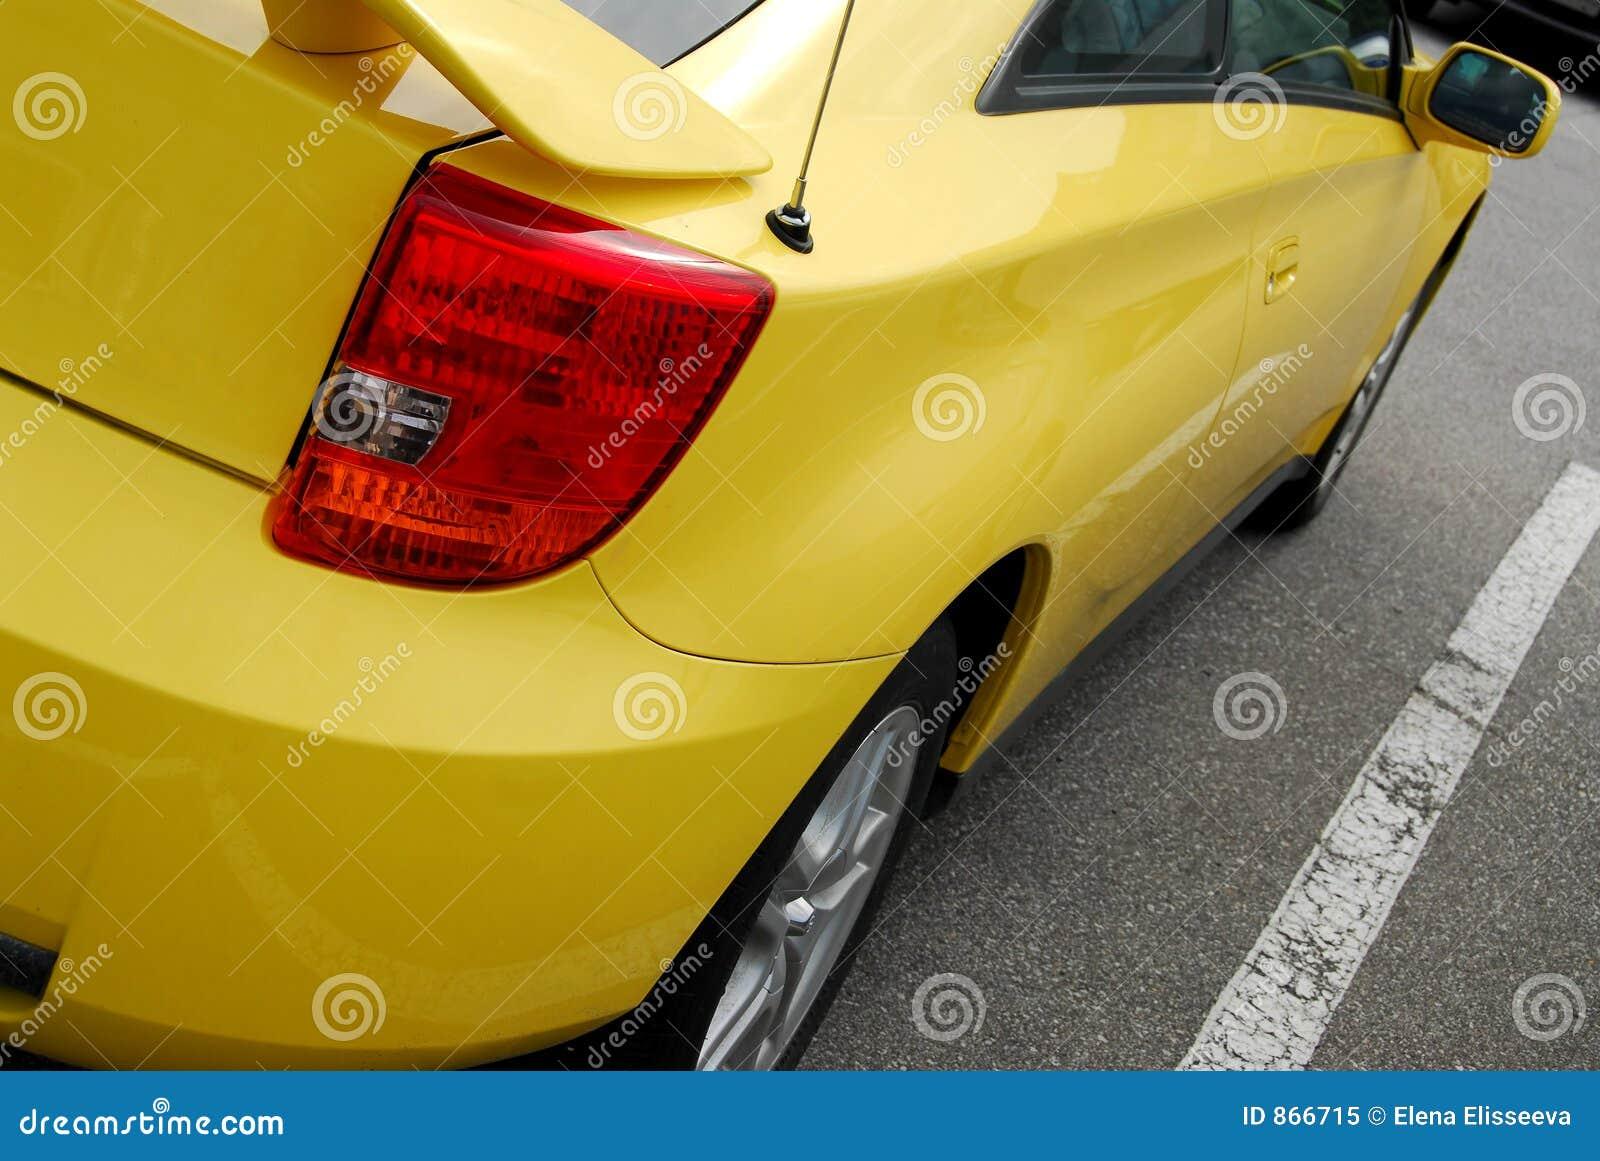 Car sports yellow